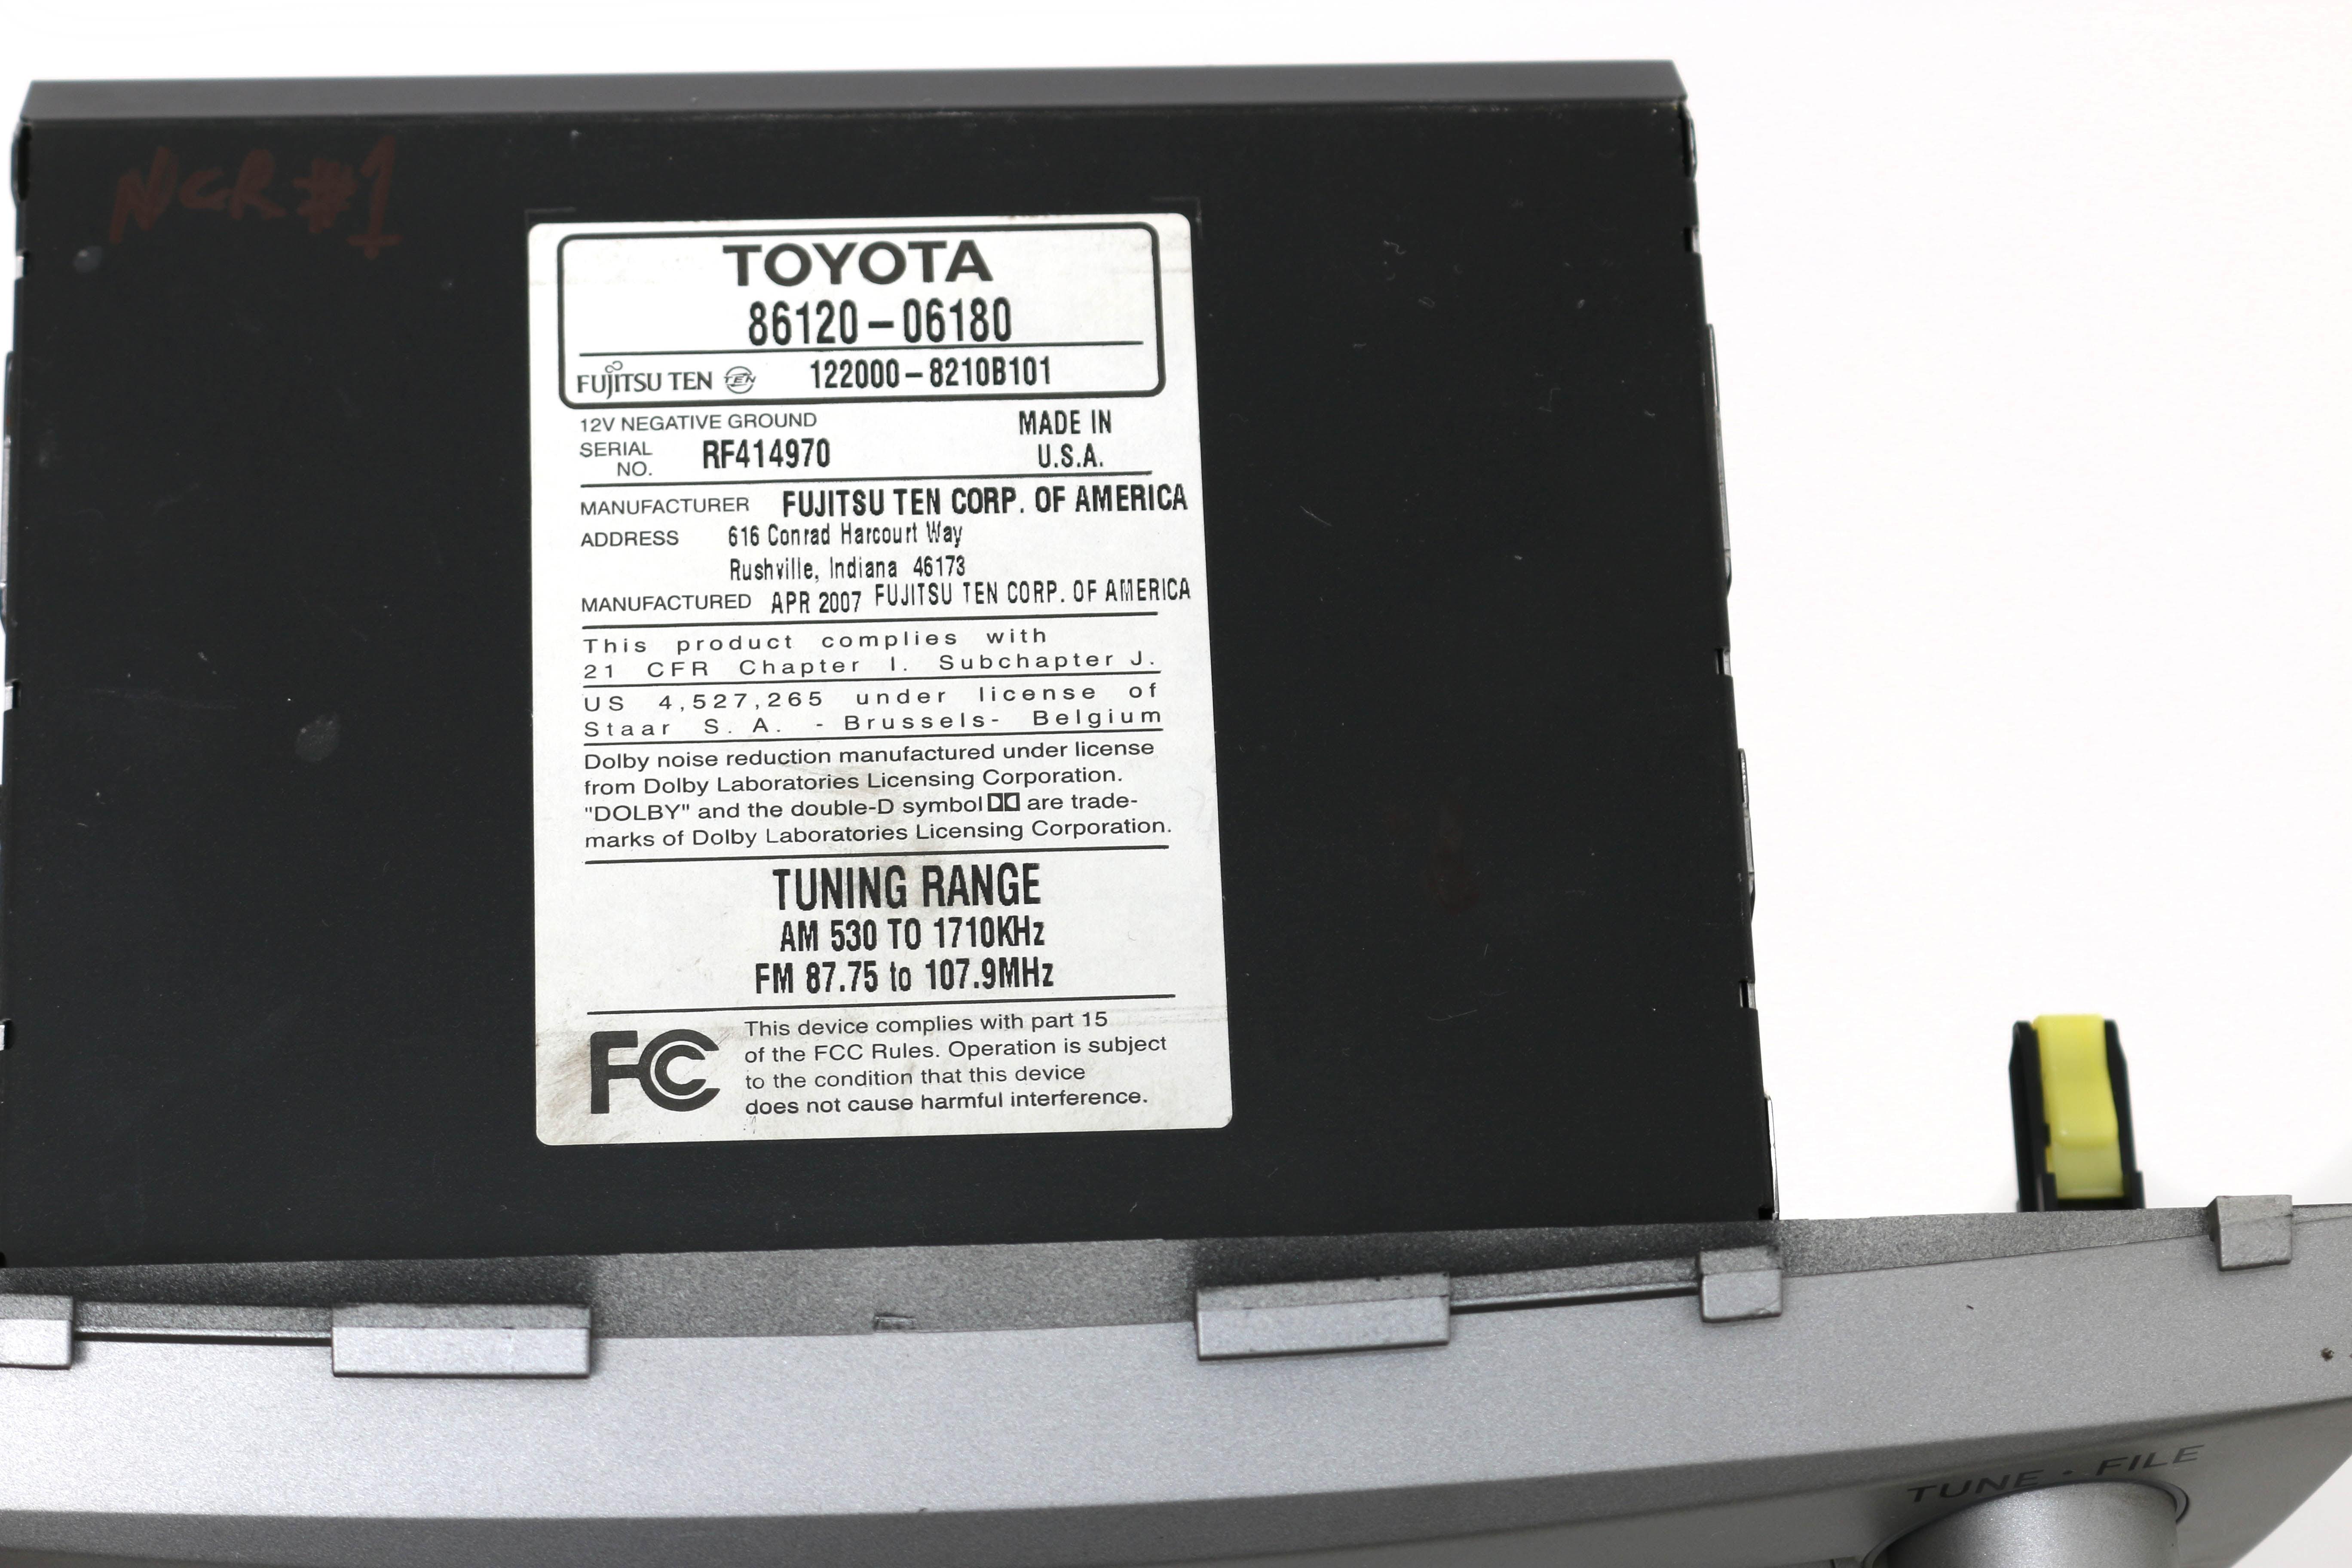 Old Fashioned Toyota Fujitsu Ten 86120 Vignette - Everything You ...